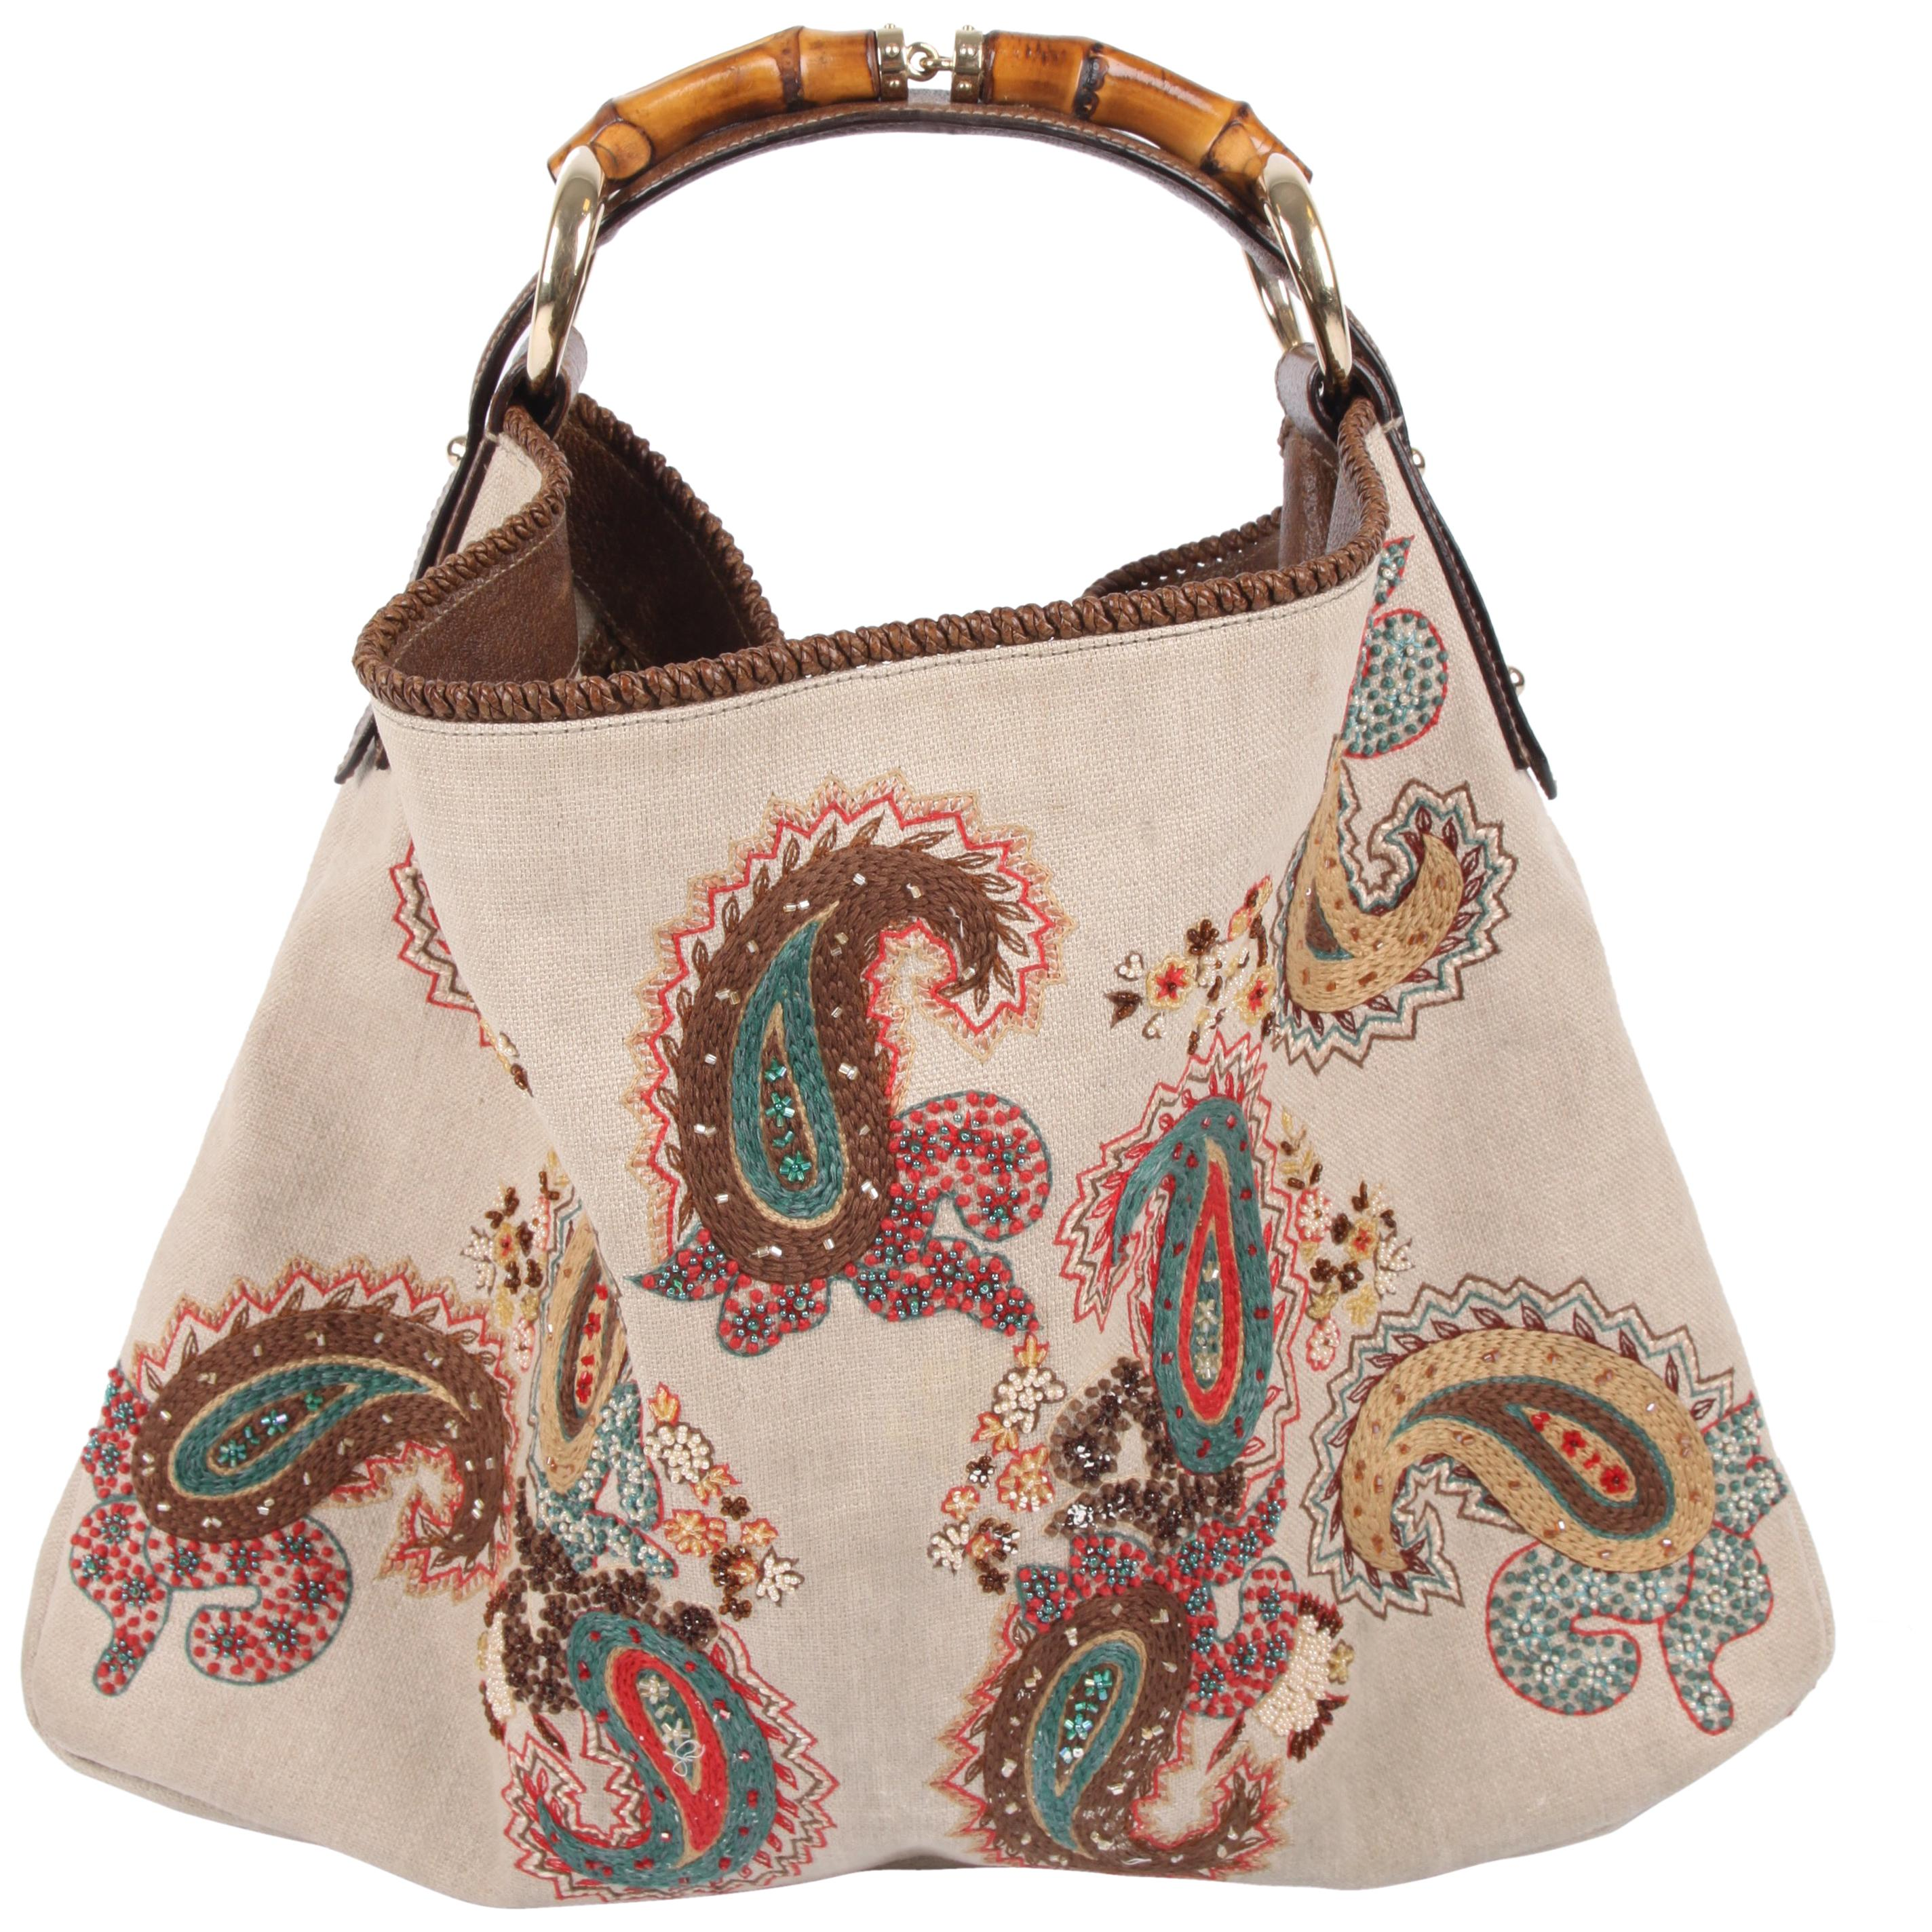 6bcb42cf558 Gucci Pelham Shoulder Bag Ostrich and Crocodile leather - brown at 1stdibs